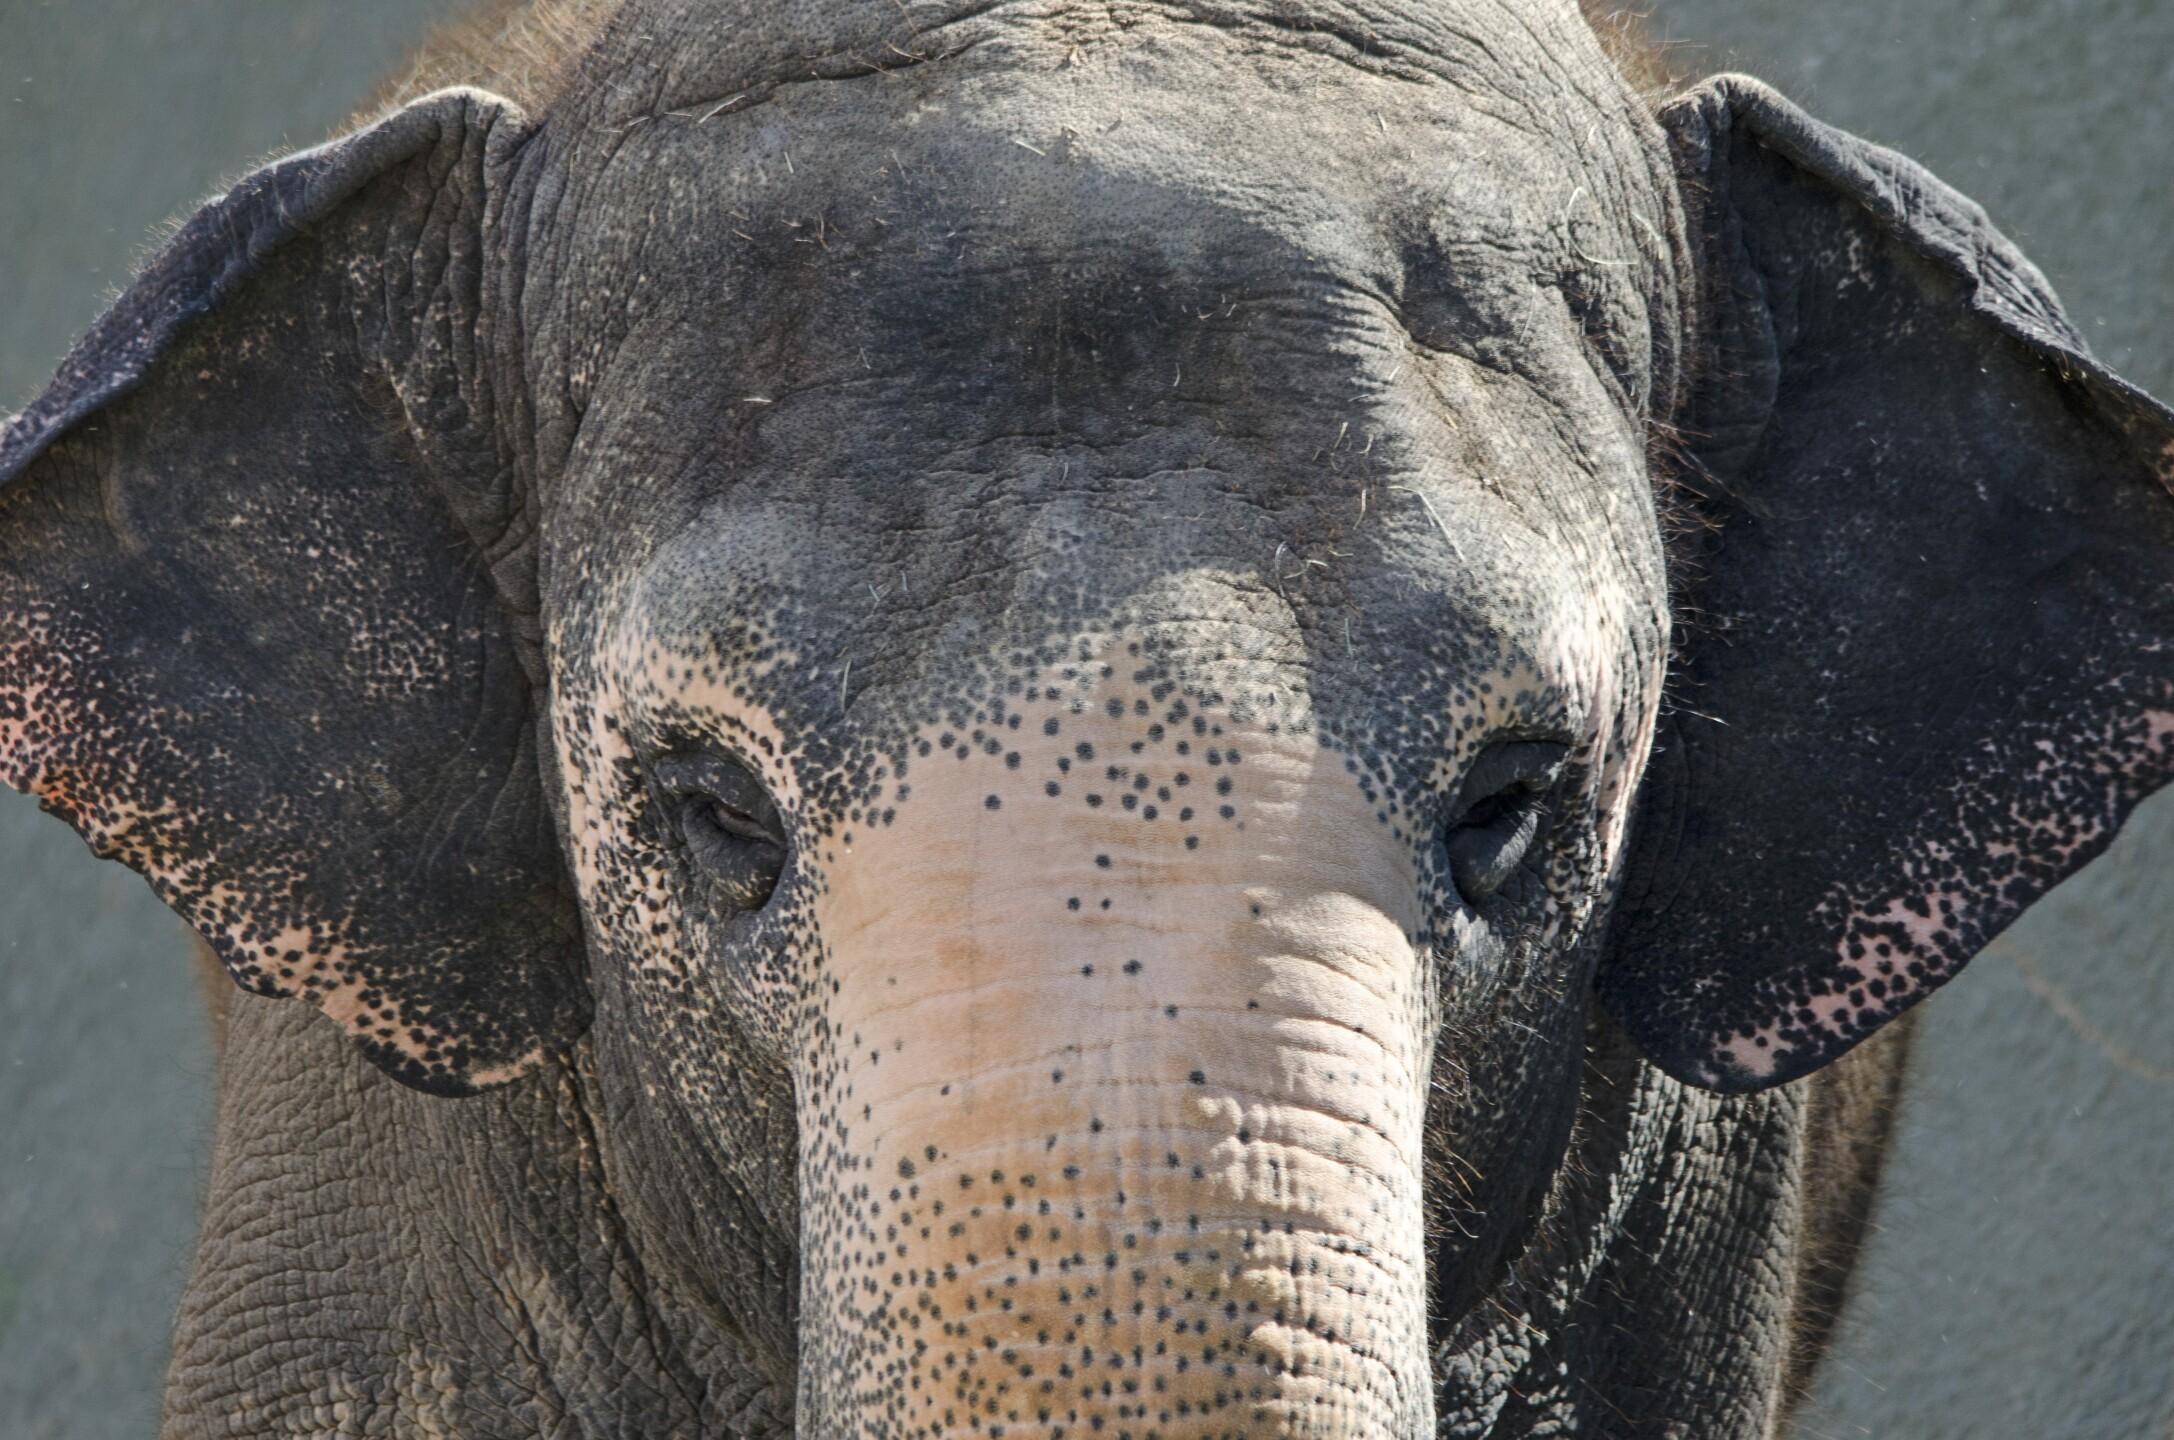 Reba Asian Elephant Phoenix Zoo - Handouts8.jpg